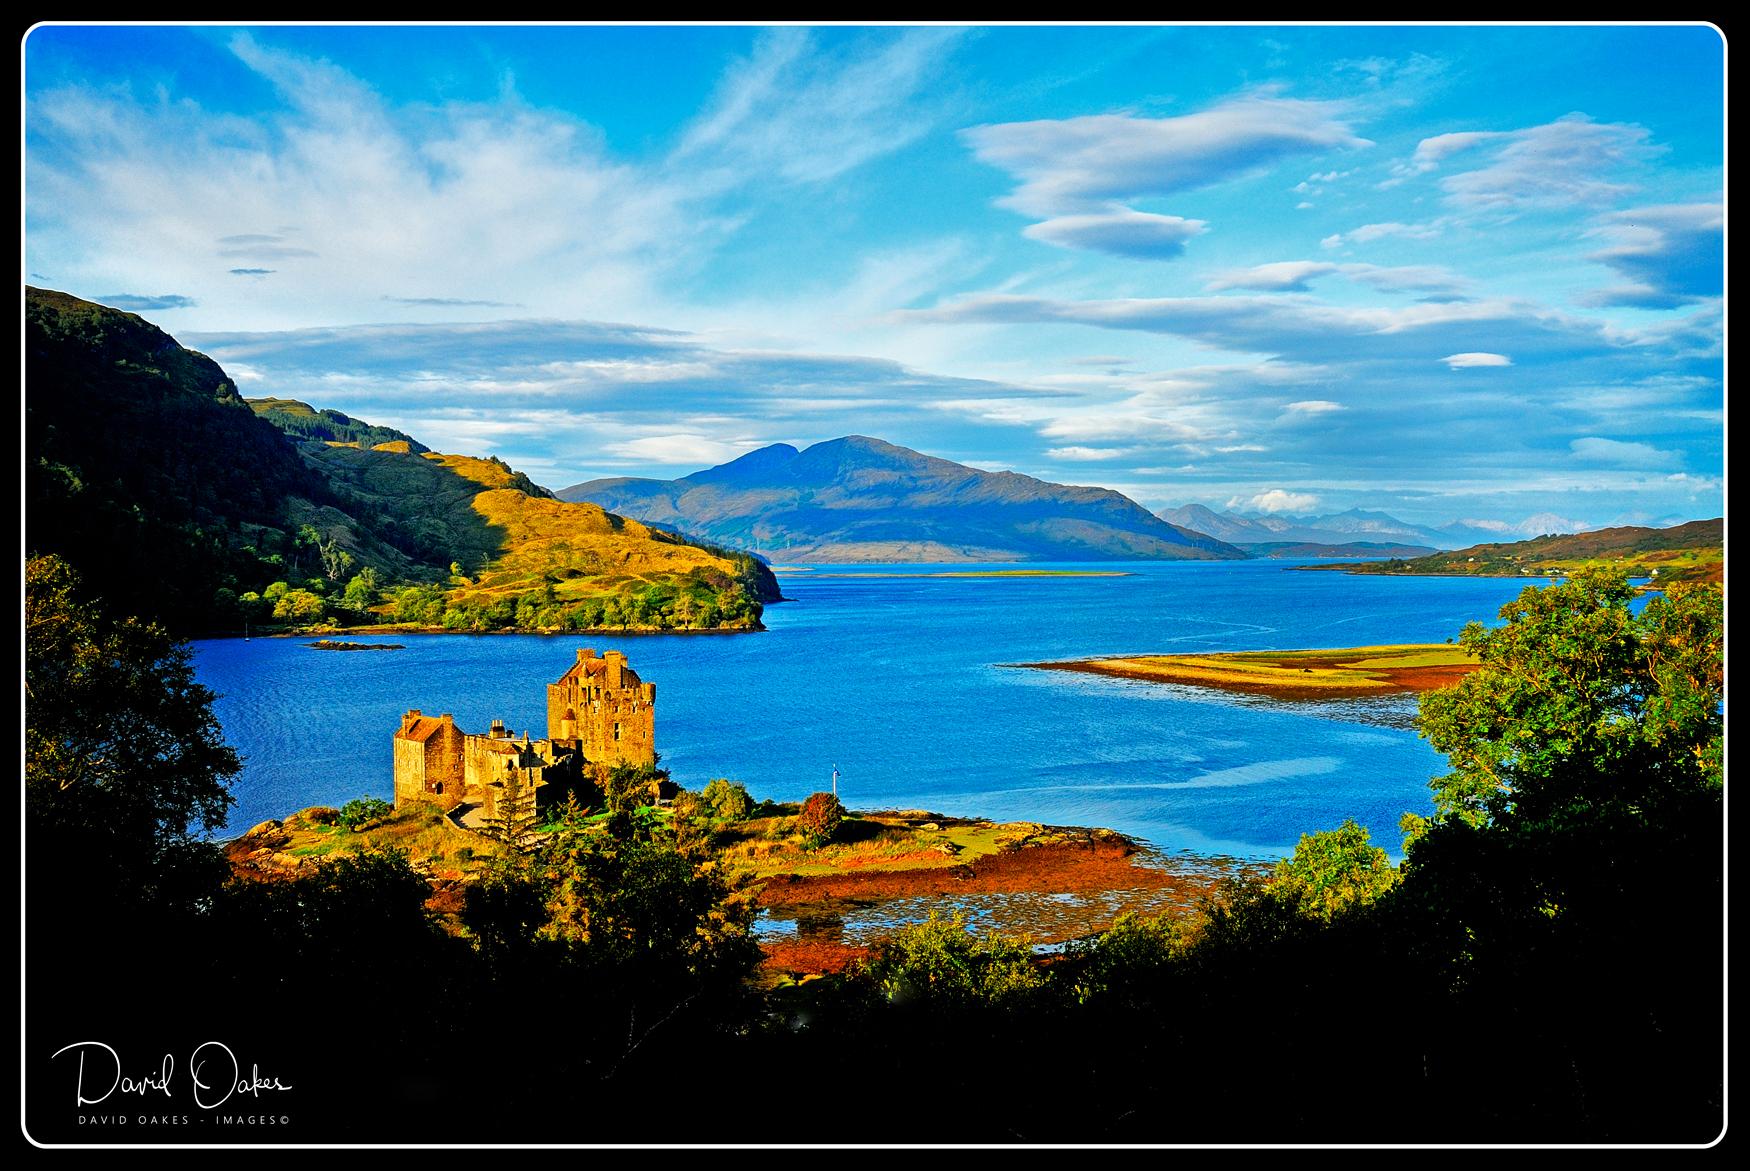 Eilean Donan Castle on Loch Duich, Morvich, Scotland